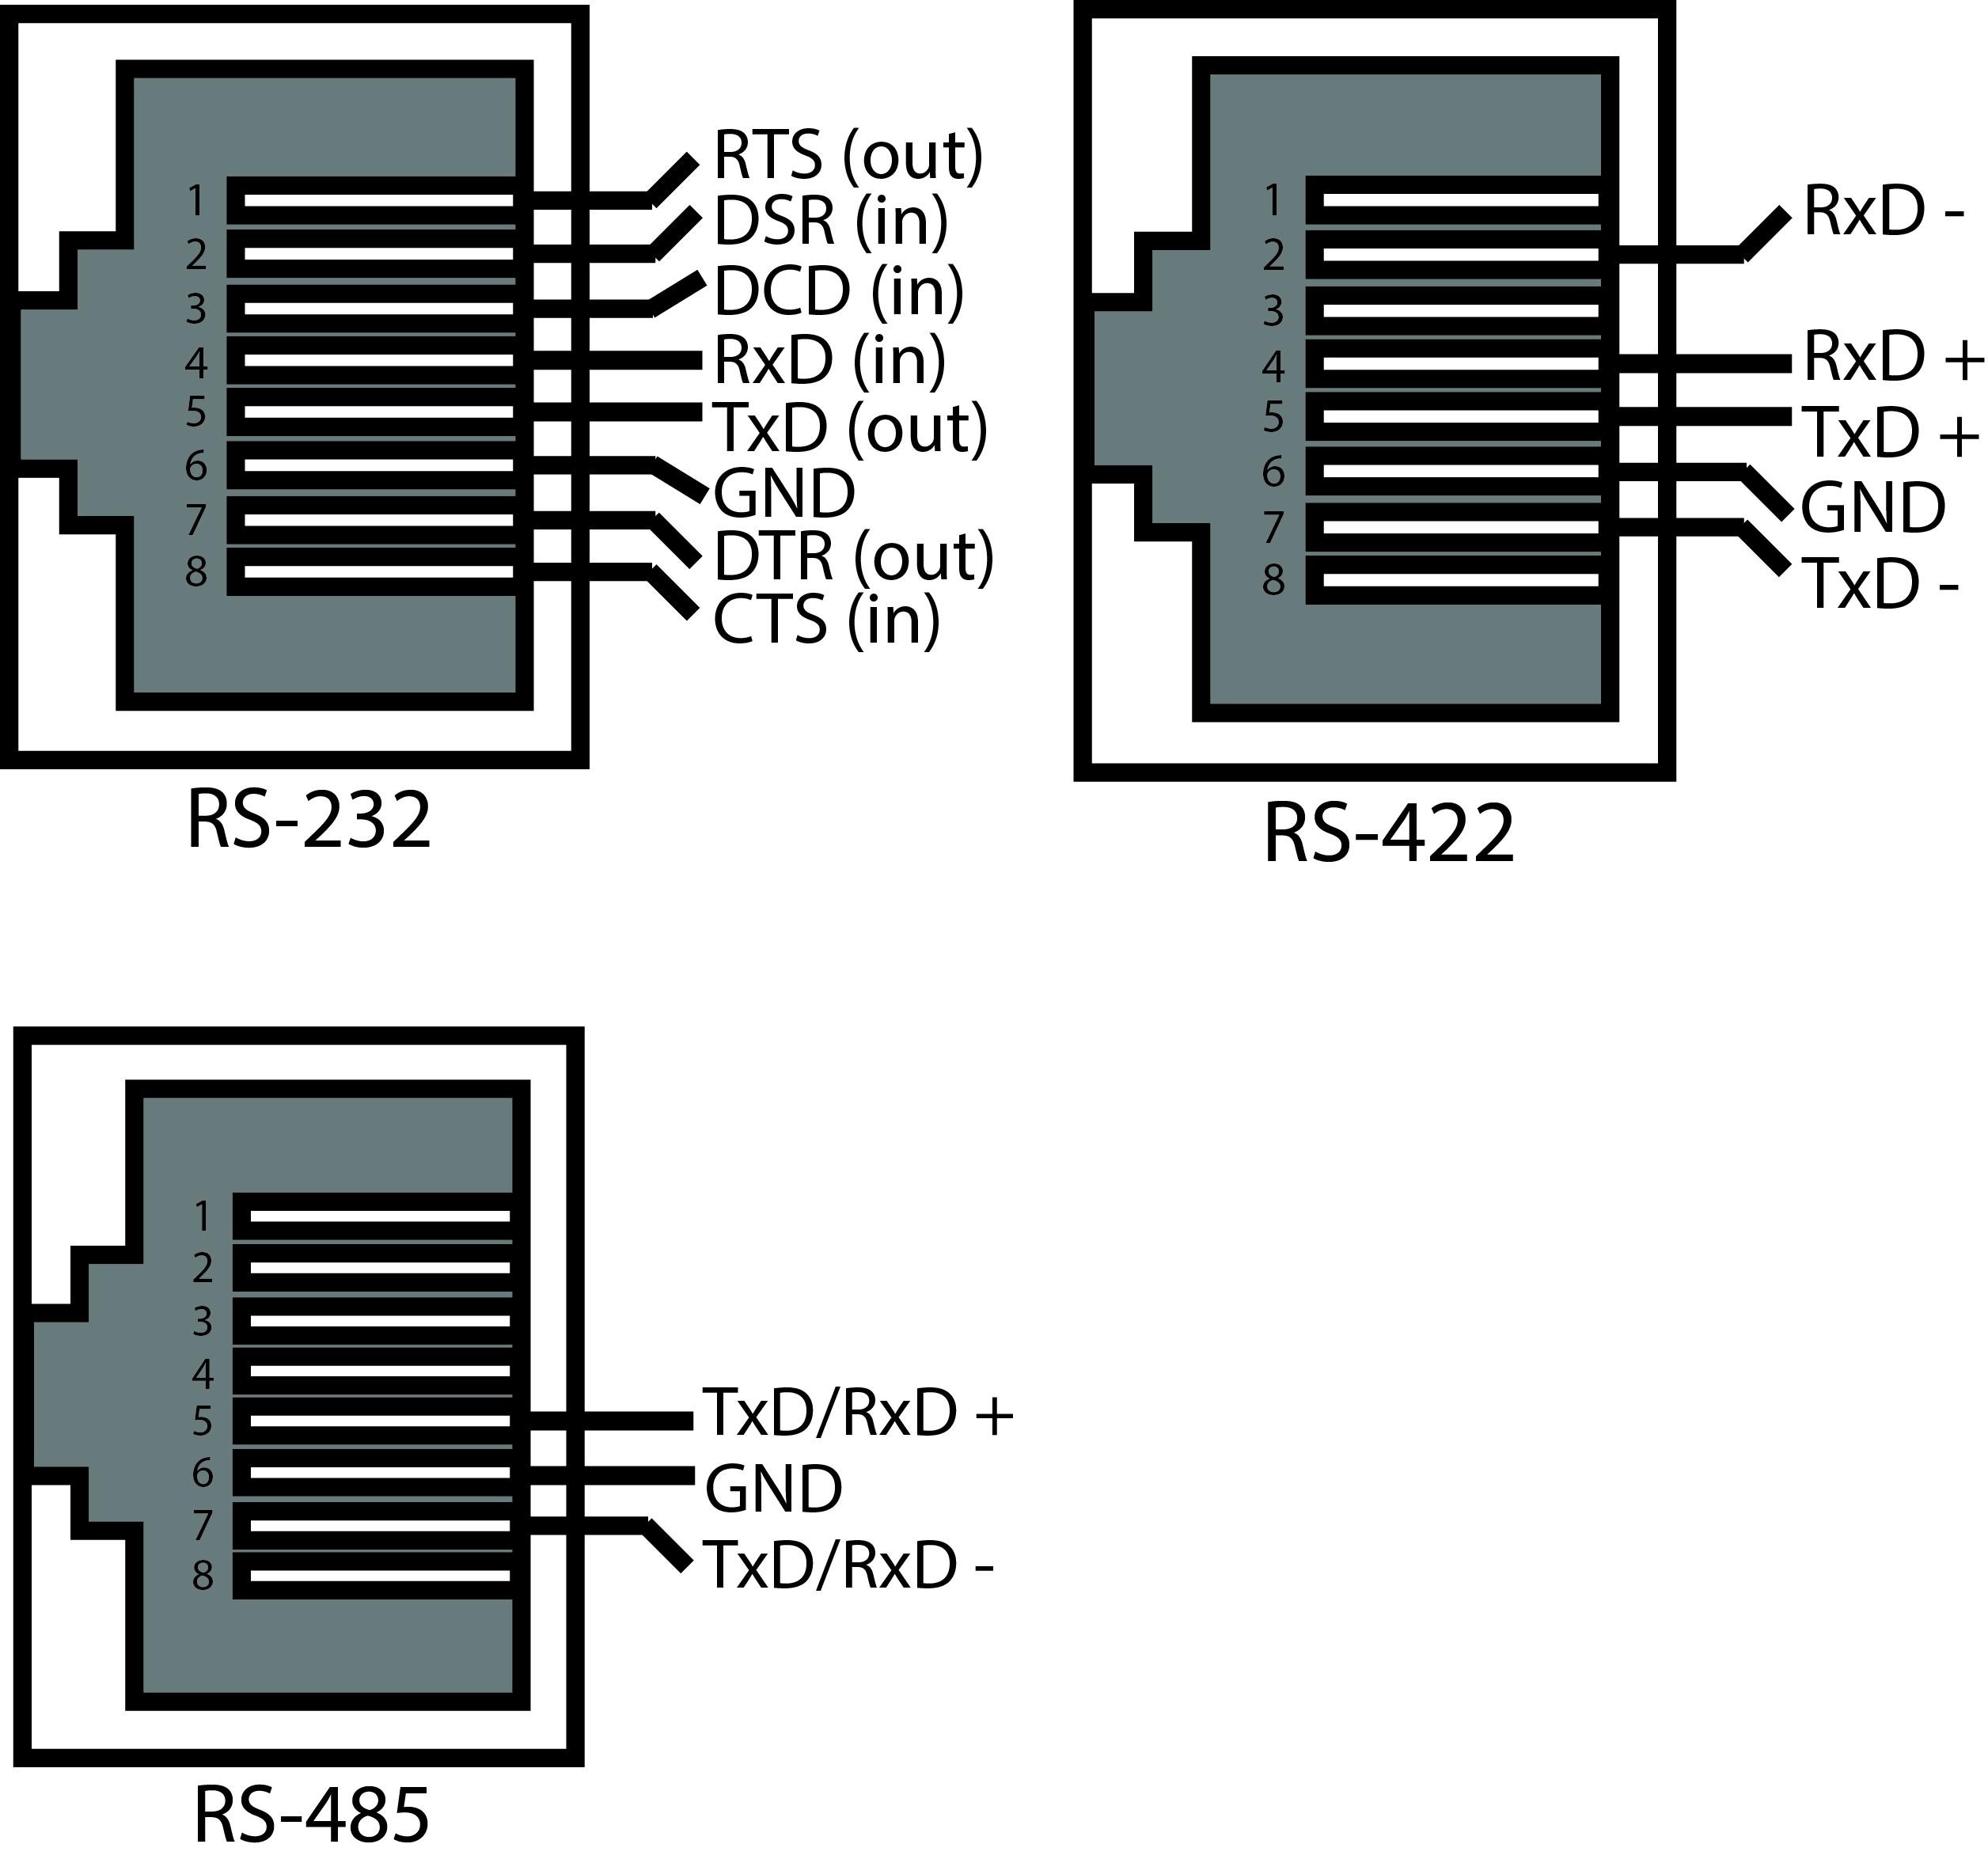 wrg 1907] rs485 wiring harnessenet wire diagram auto electrical wiring diagram rb25det tps wiring diagram 2007 flht wiring diagram